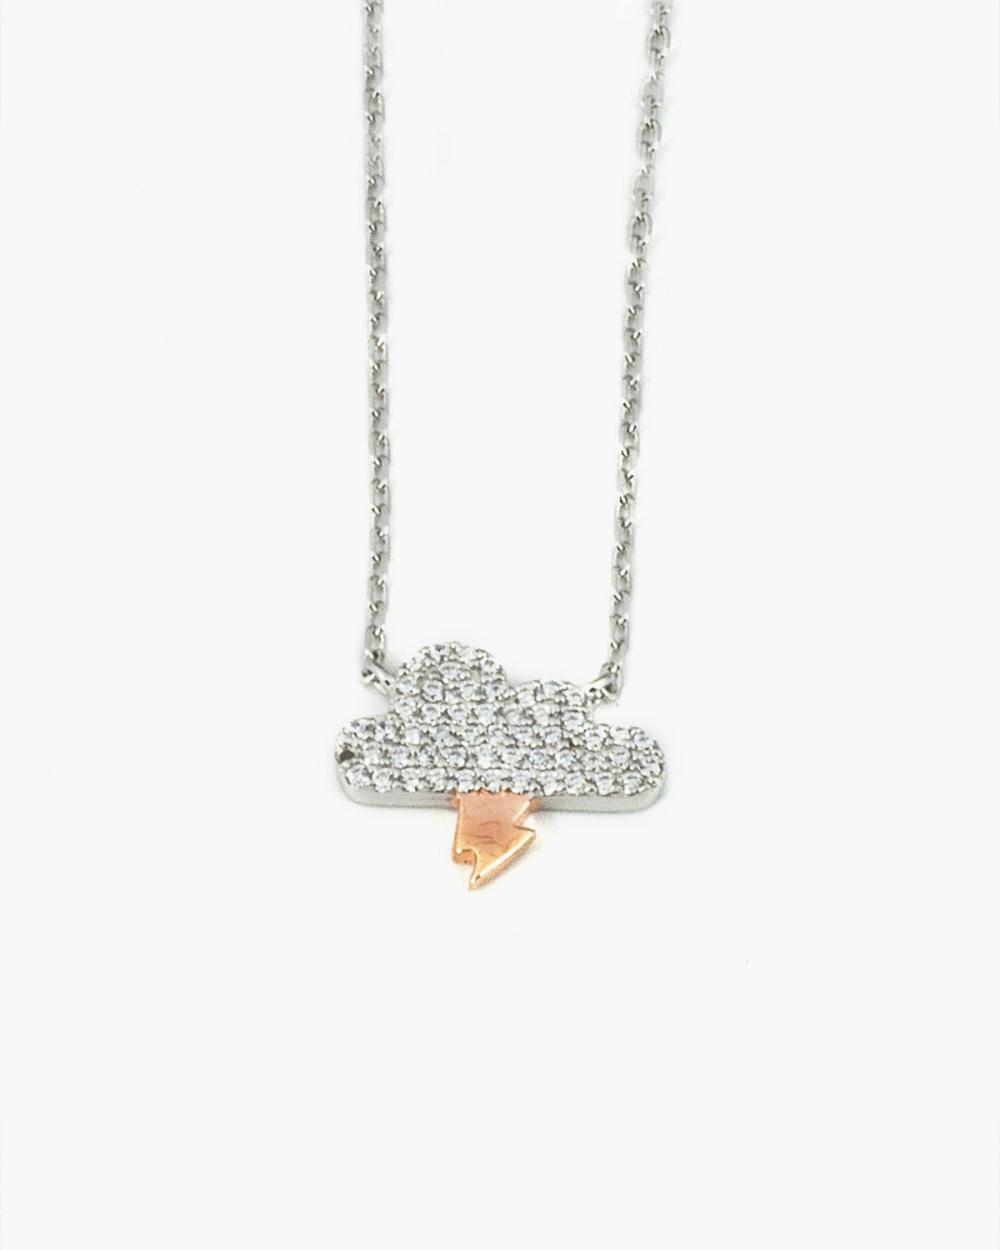 Necklaces PINK GOLD CLOUD AND ARROW ZIRCON NECKLACE NOVE25